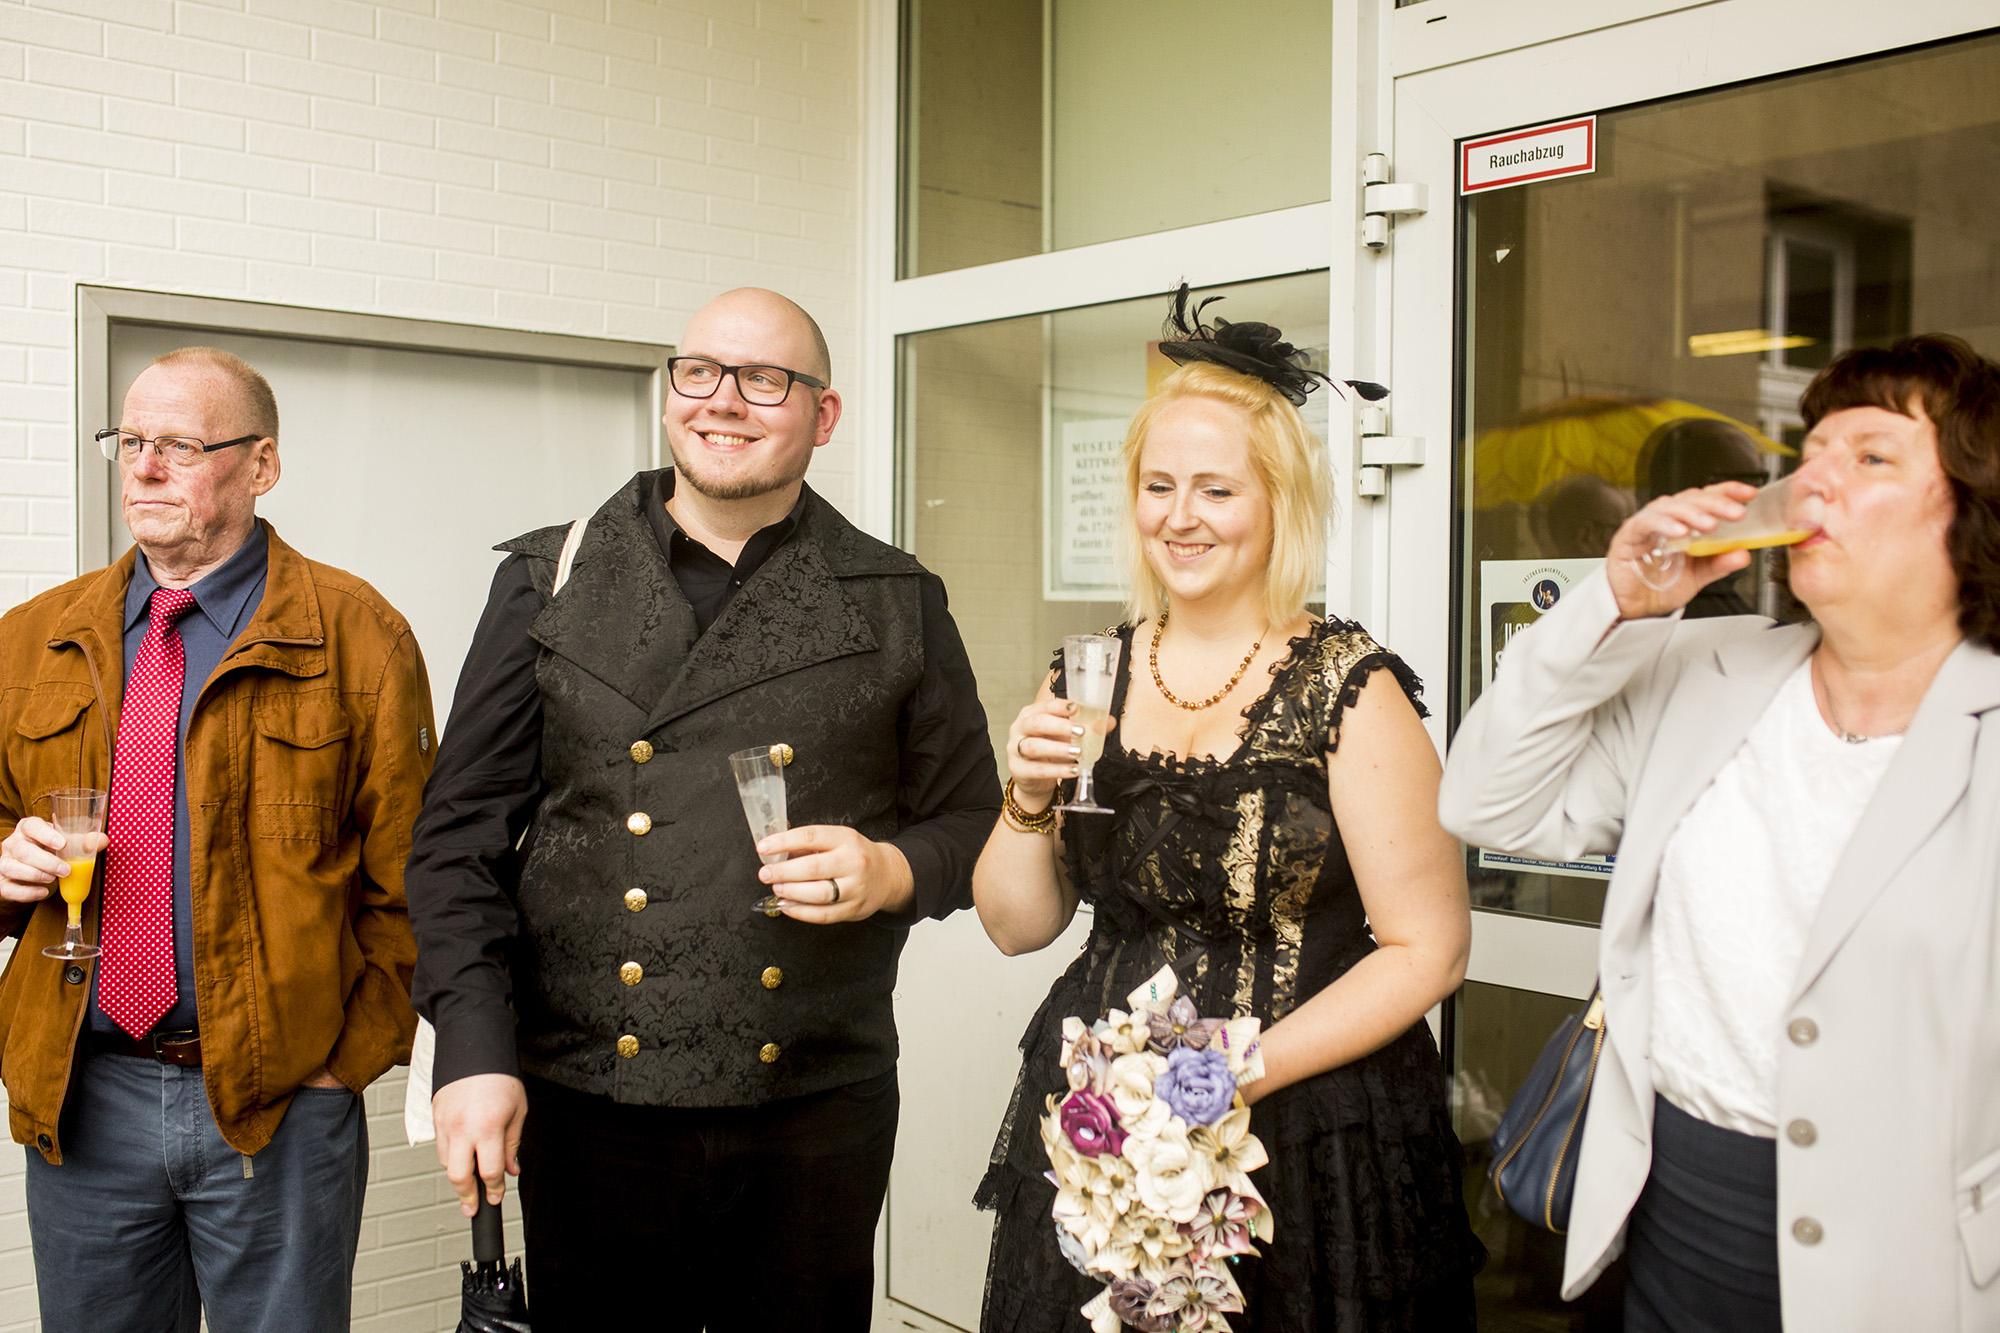 Seriously_Sabrina_Photography_Essen_Germany_RocknRoll_Hochzeit_Wedding_PatrickJenny63.jpg